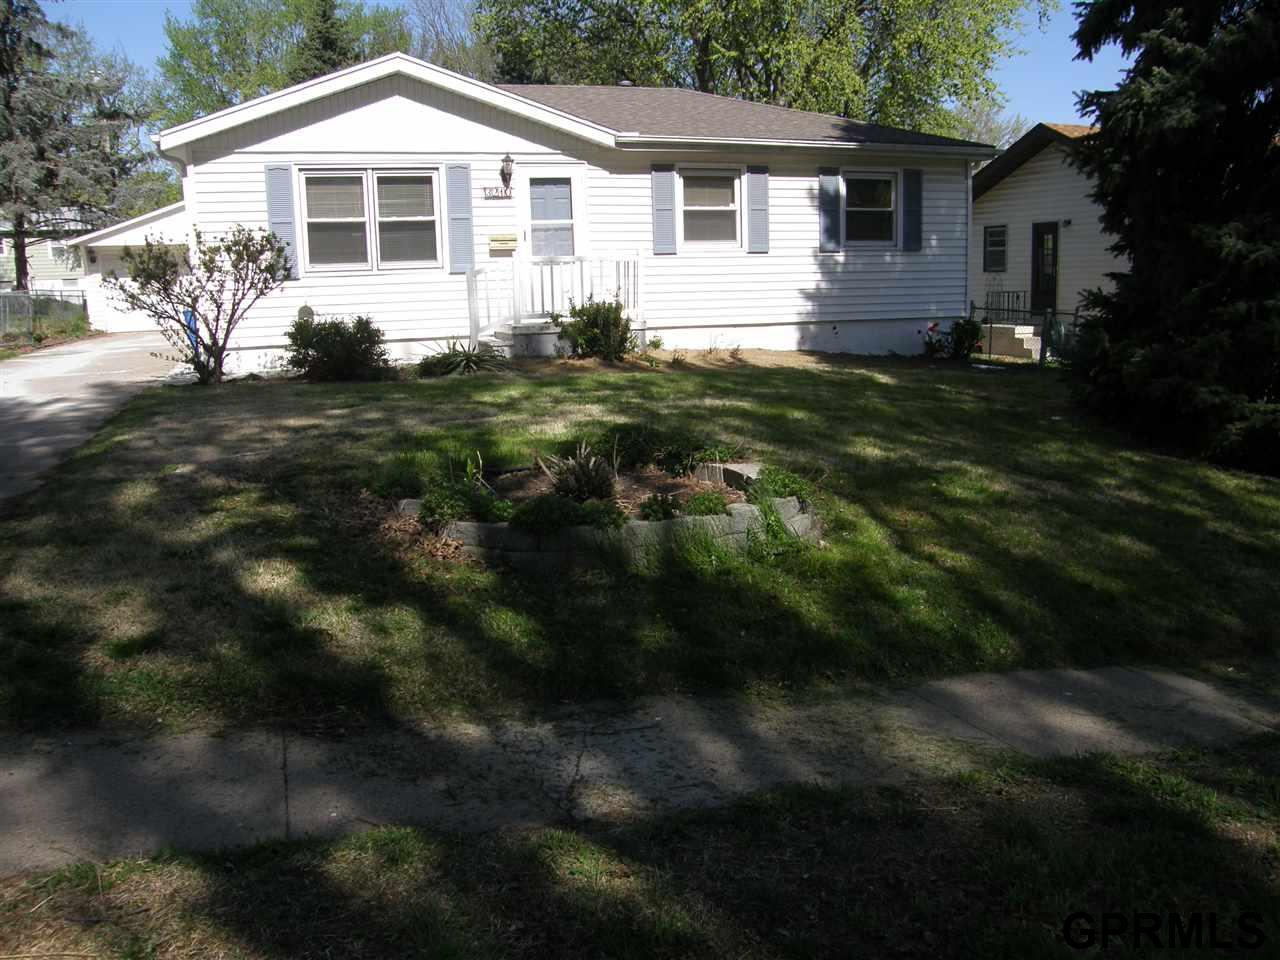 Rental Homes for Rent, ListingId:33026399, location: 3210 S 90th St Omaha 68124